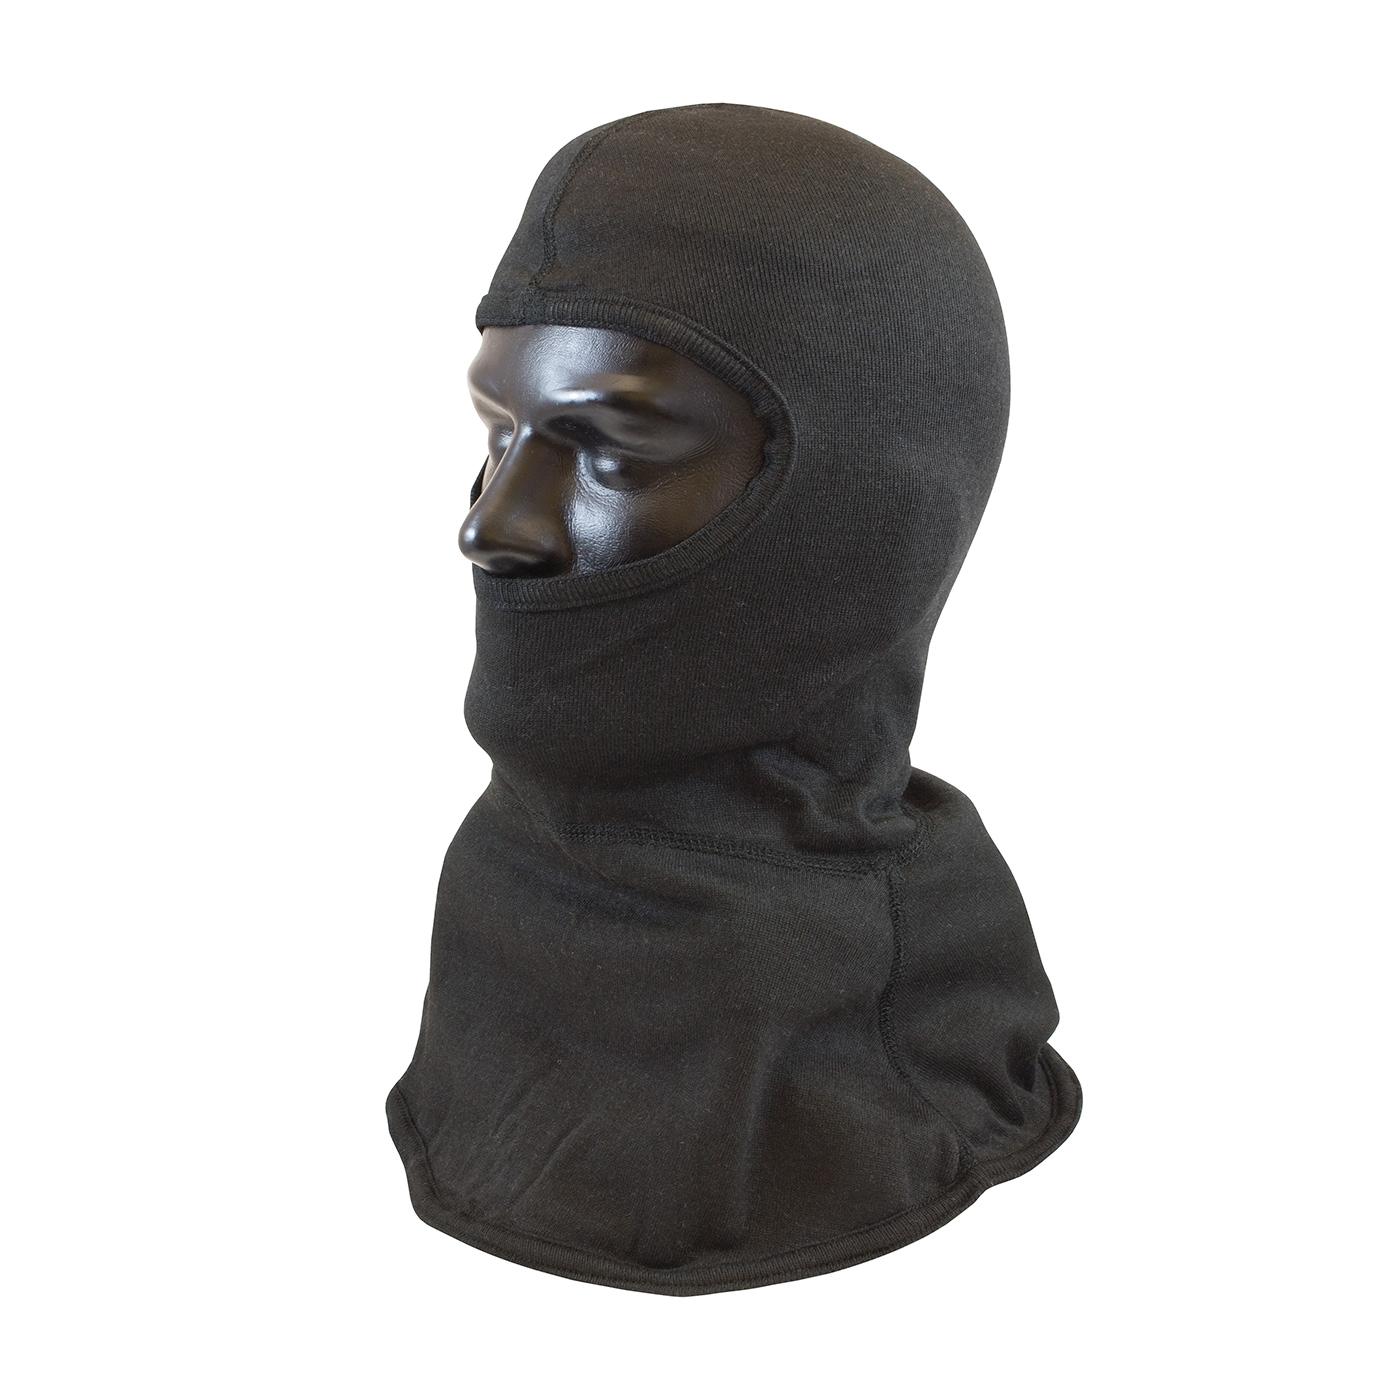 PIP® 906-8416CBX Single Layer Fire Resistant Hood With Bib, Universal, Black, 21 in L, 84% Carbon/16% Technora®, 6 oz Fabric, Straight Cut Full Face Closure